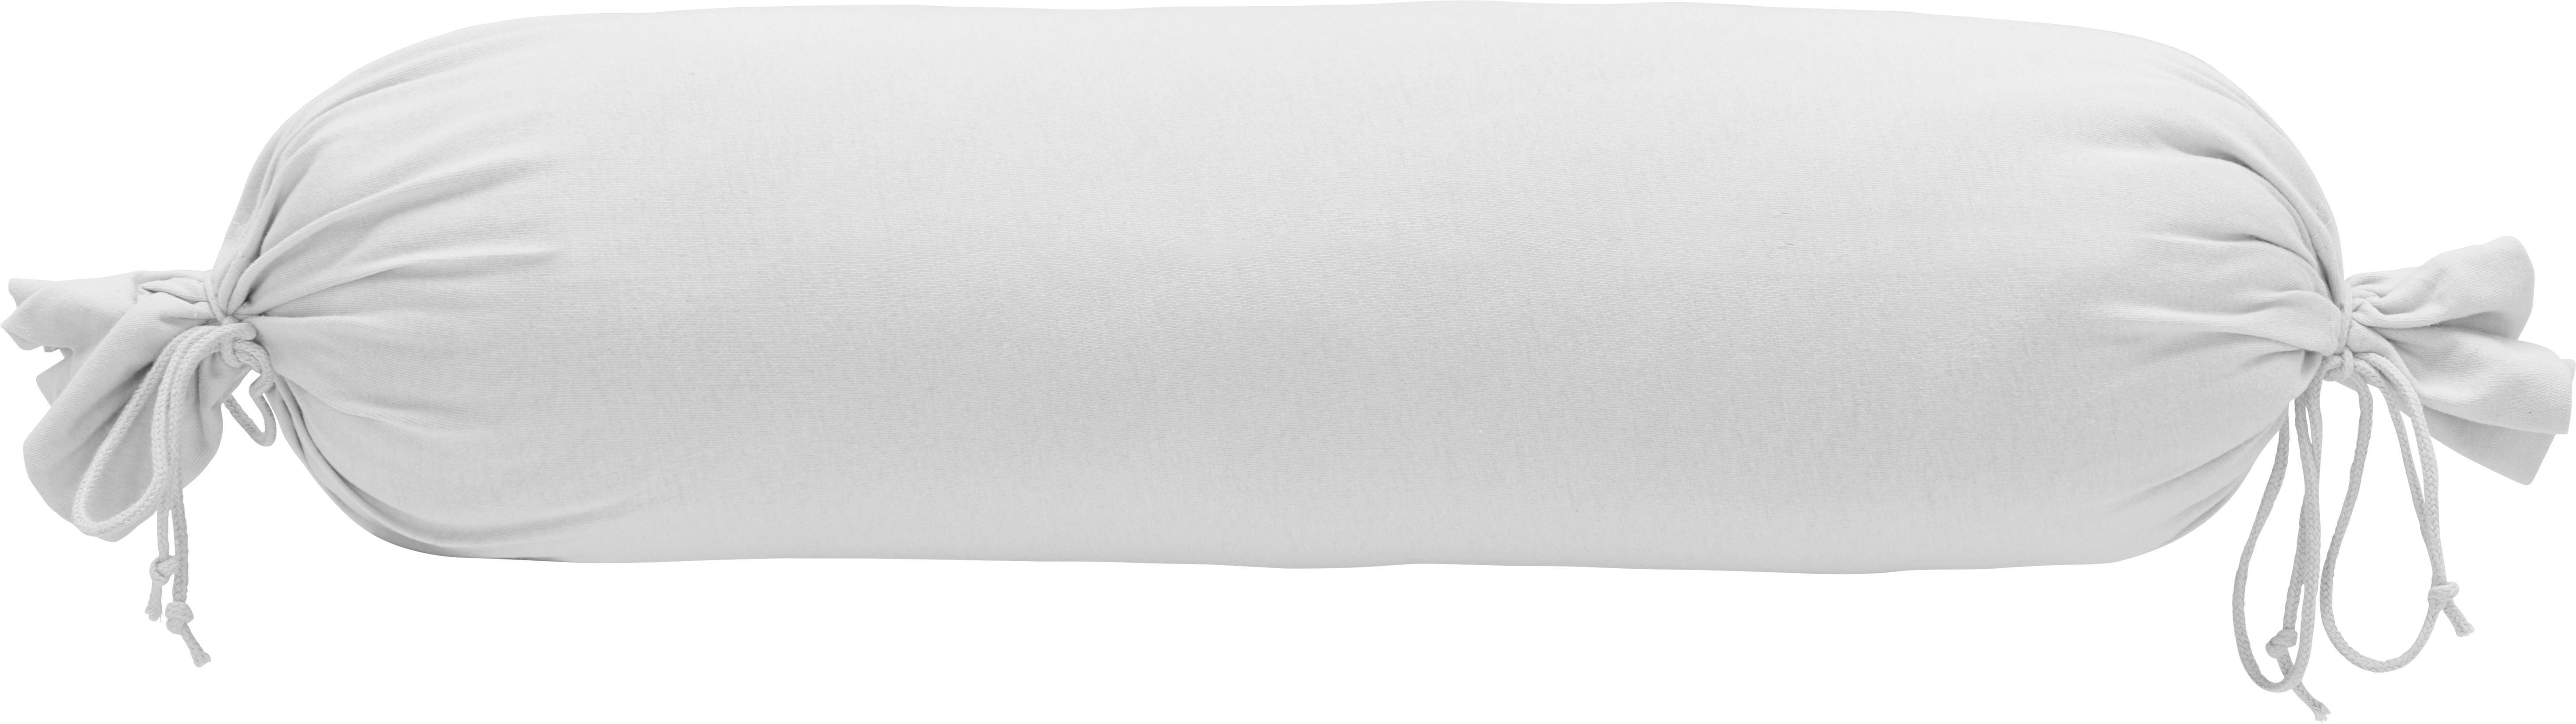 Kissenhülle Basic, ca. 15x40cm - Platinfarben, Textil (15/40cm) - MÖMAX modern living